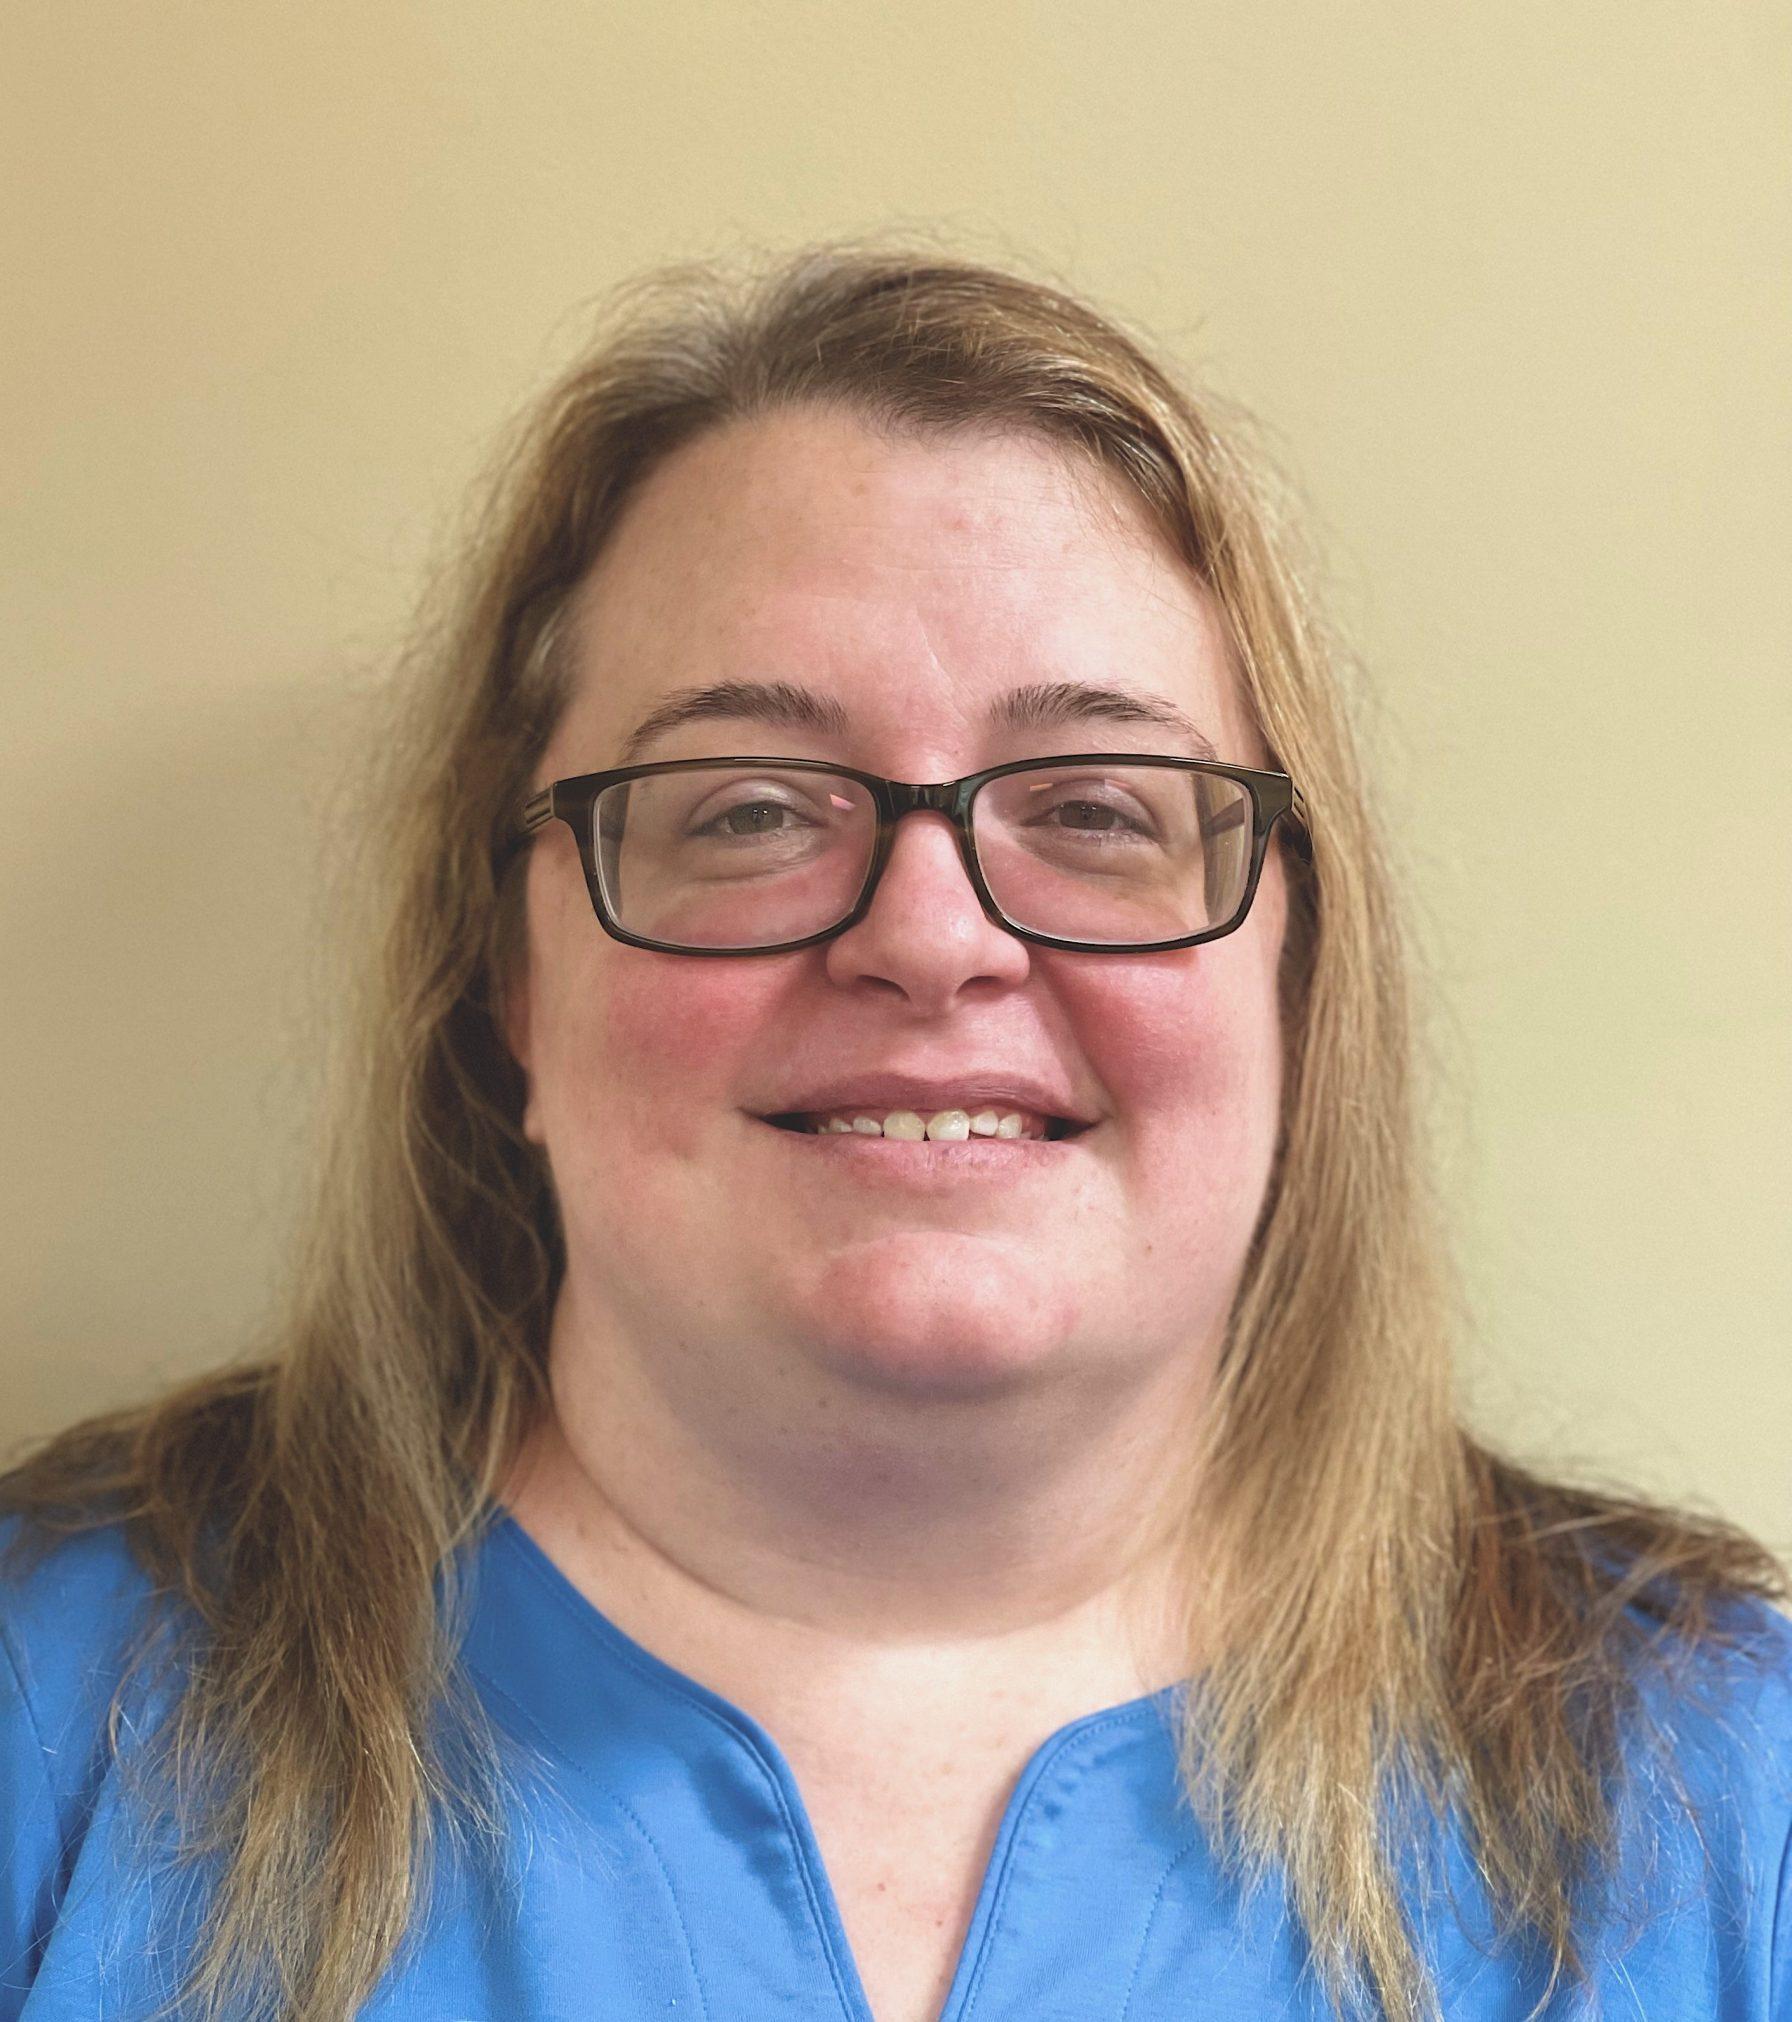 Danielle Smith, Executive Assistant